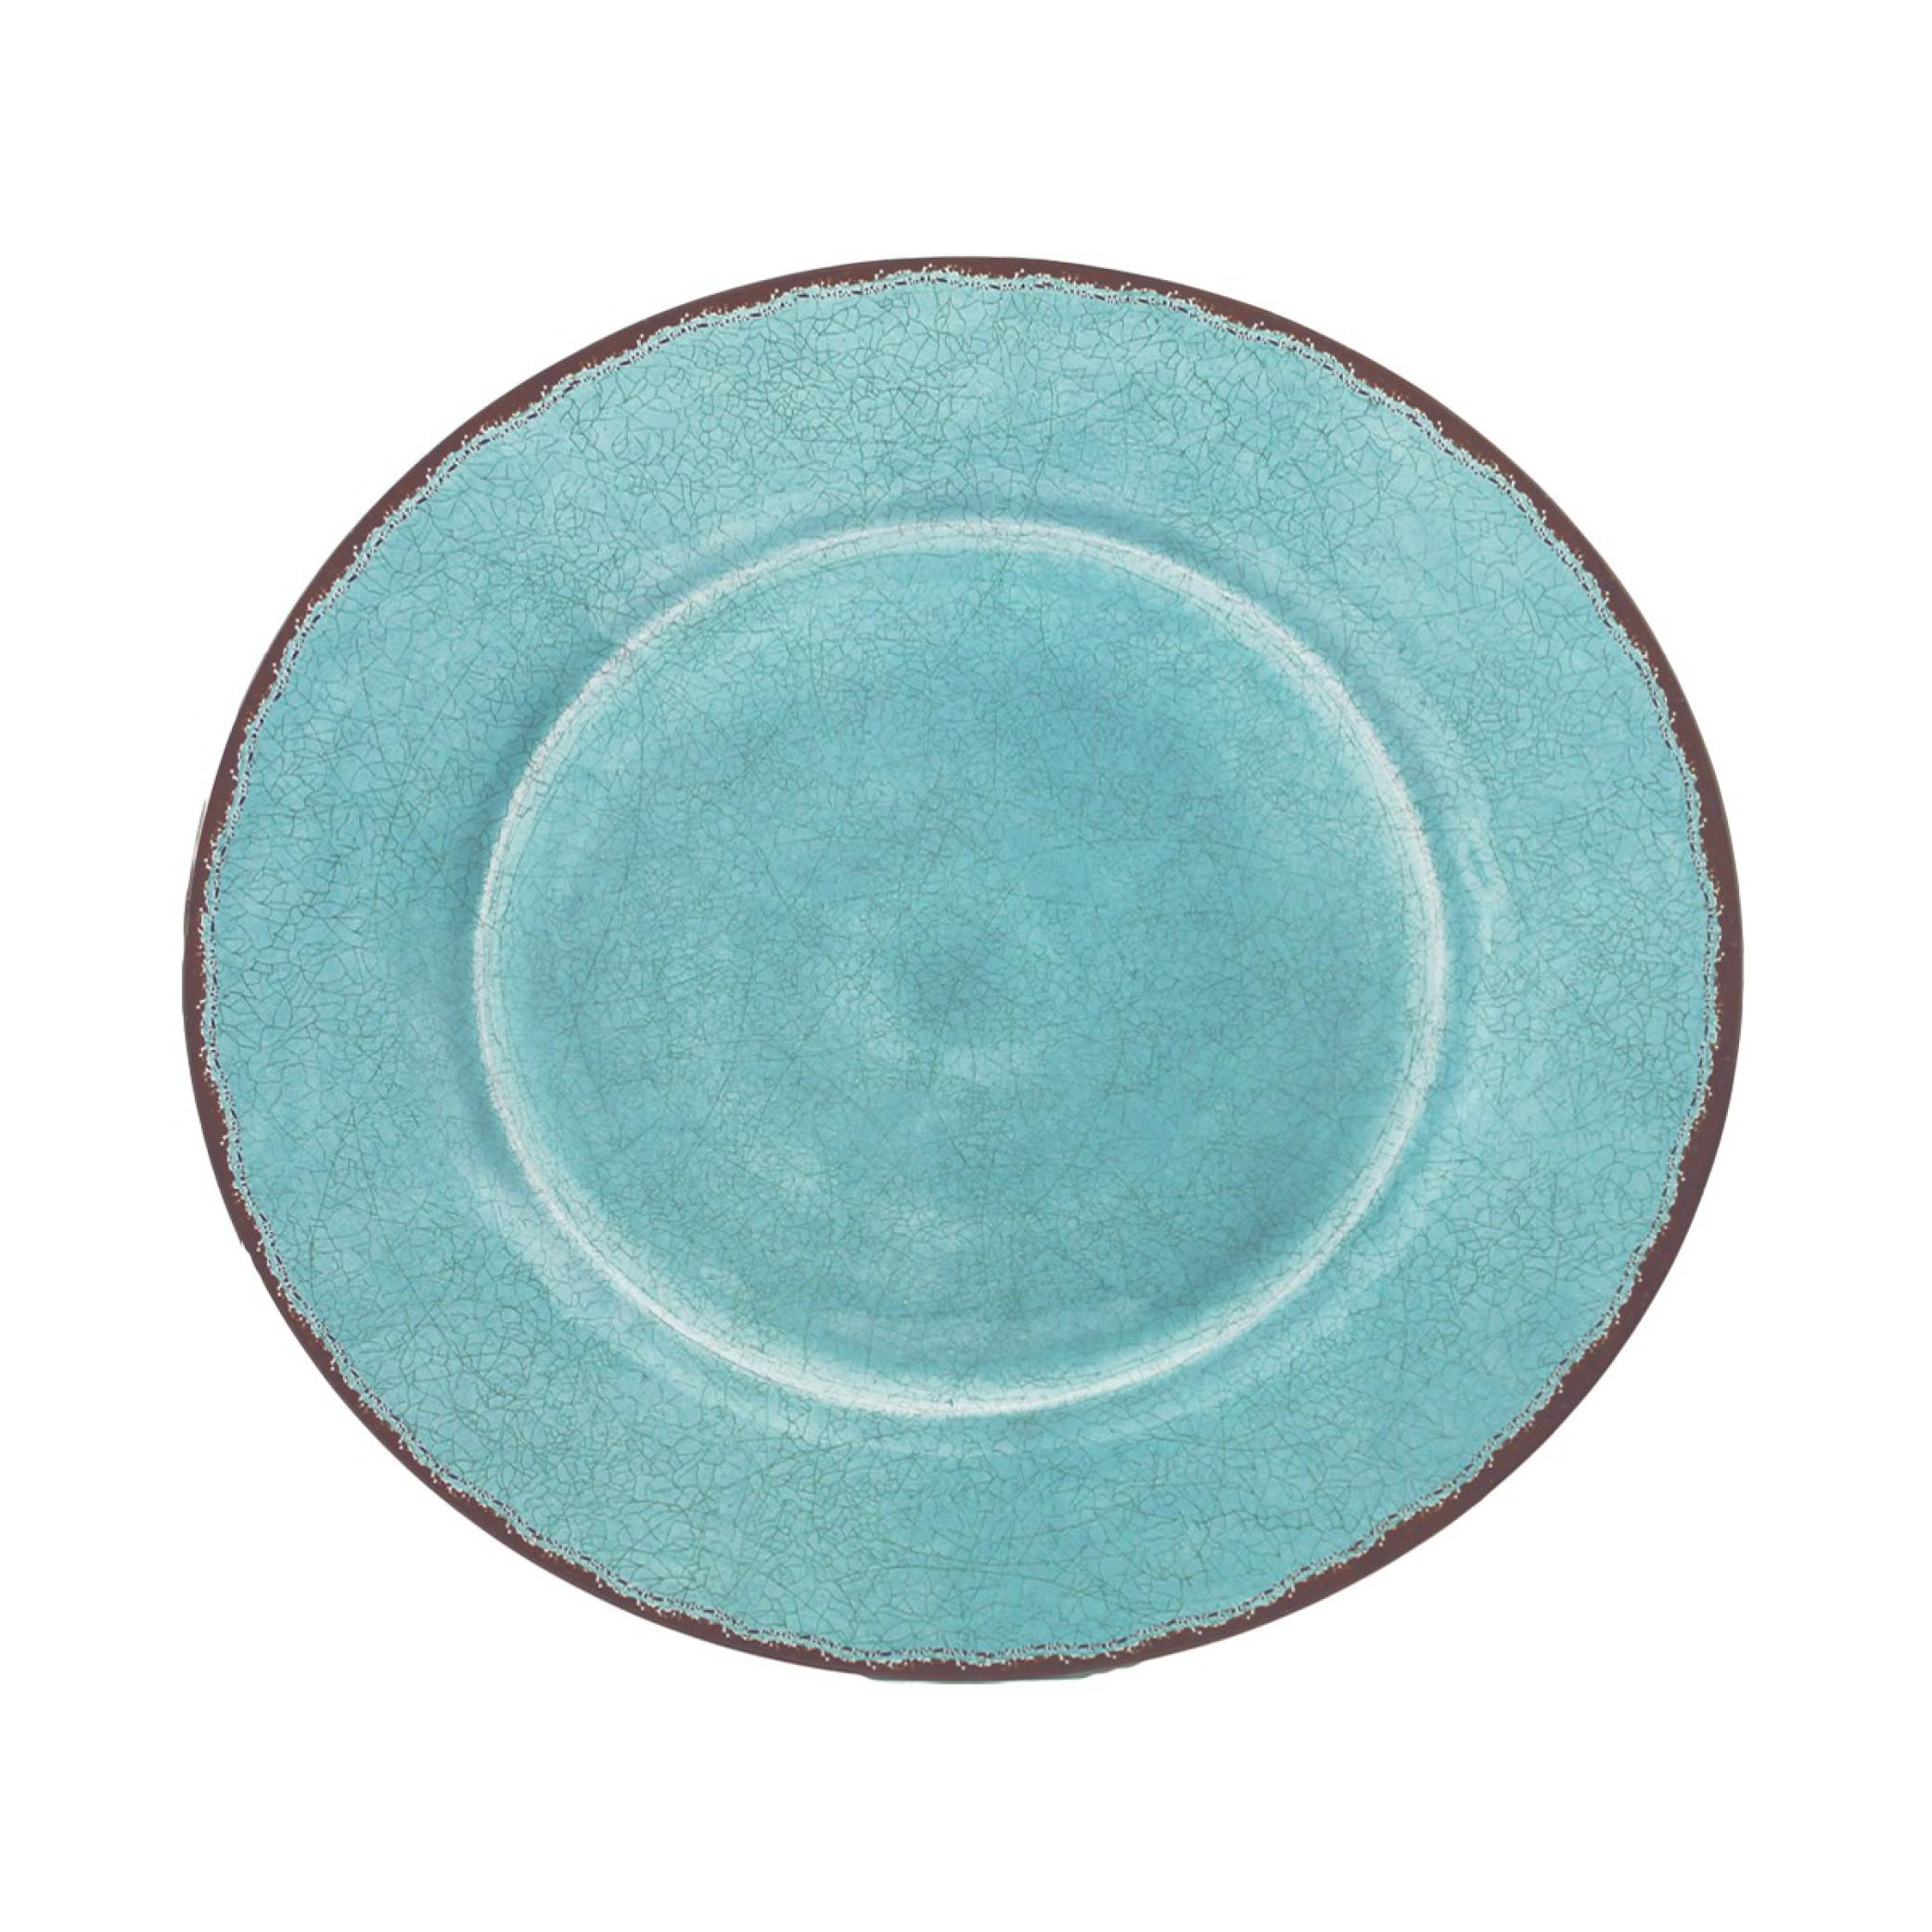 Antiqua Turquoise Platter $37.95   Wants 1 Has 1 Needs 0